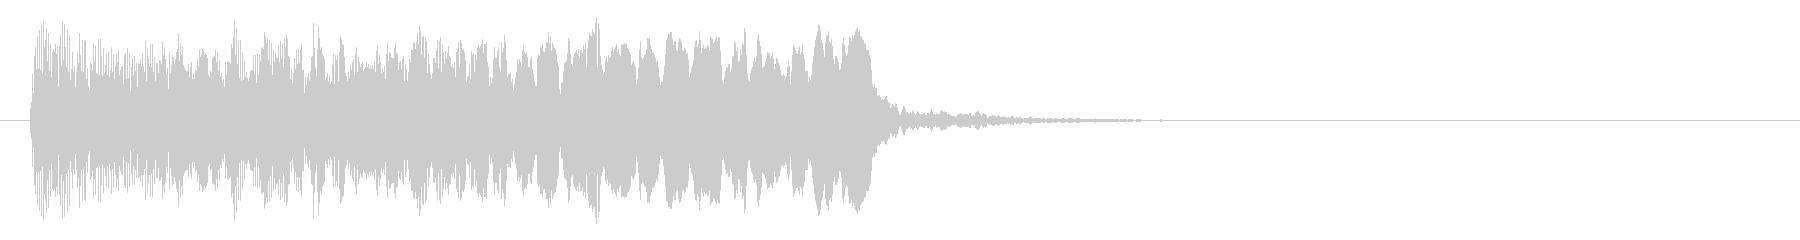 8bitパワーup-01-4_revの未再生の波形